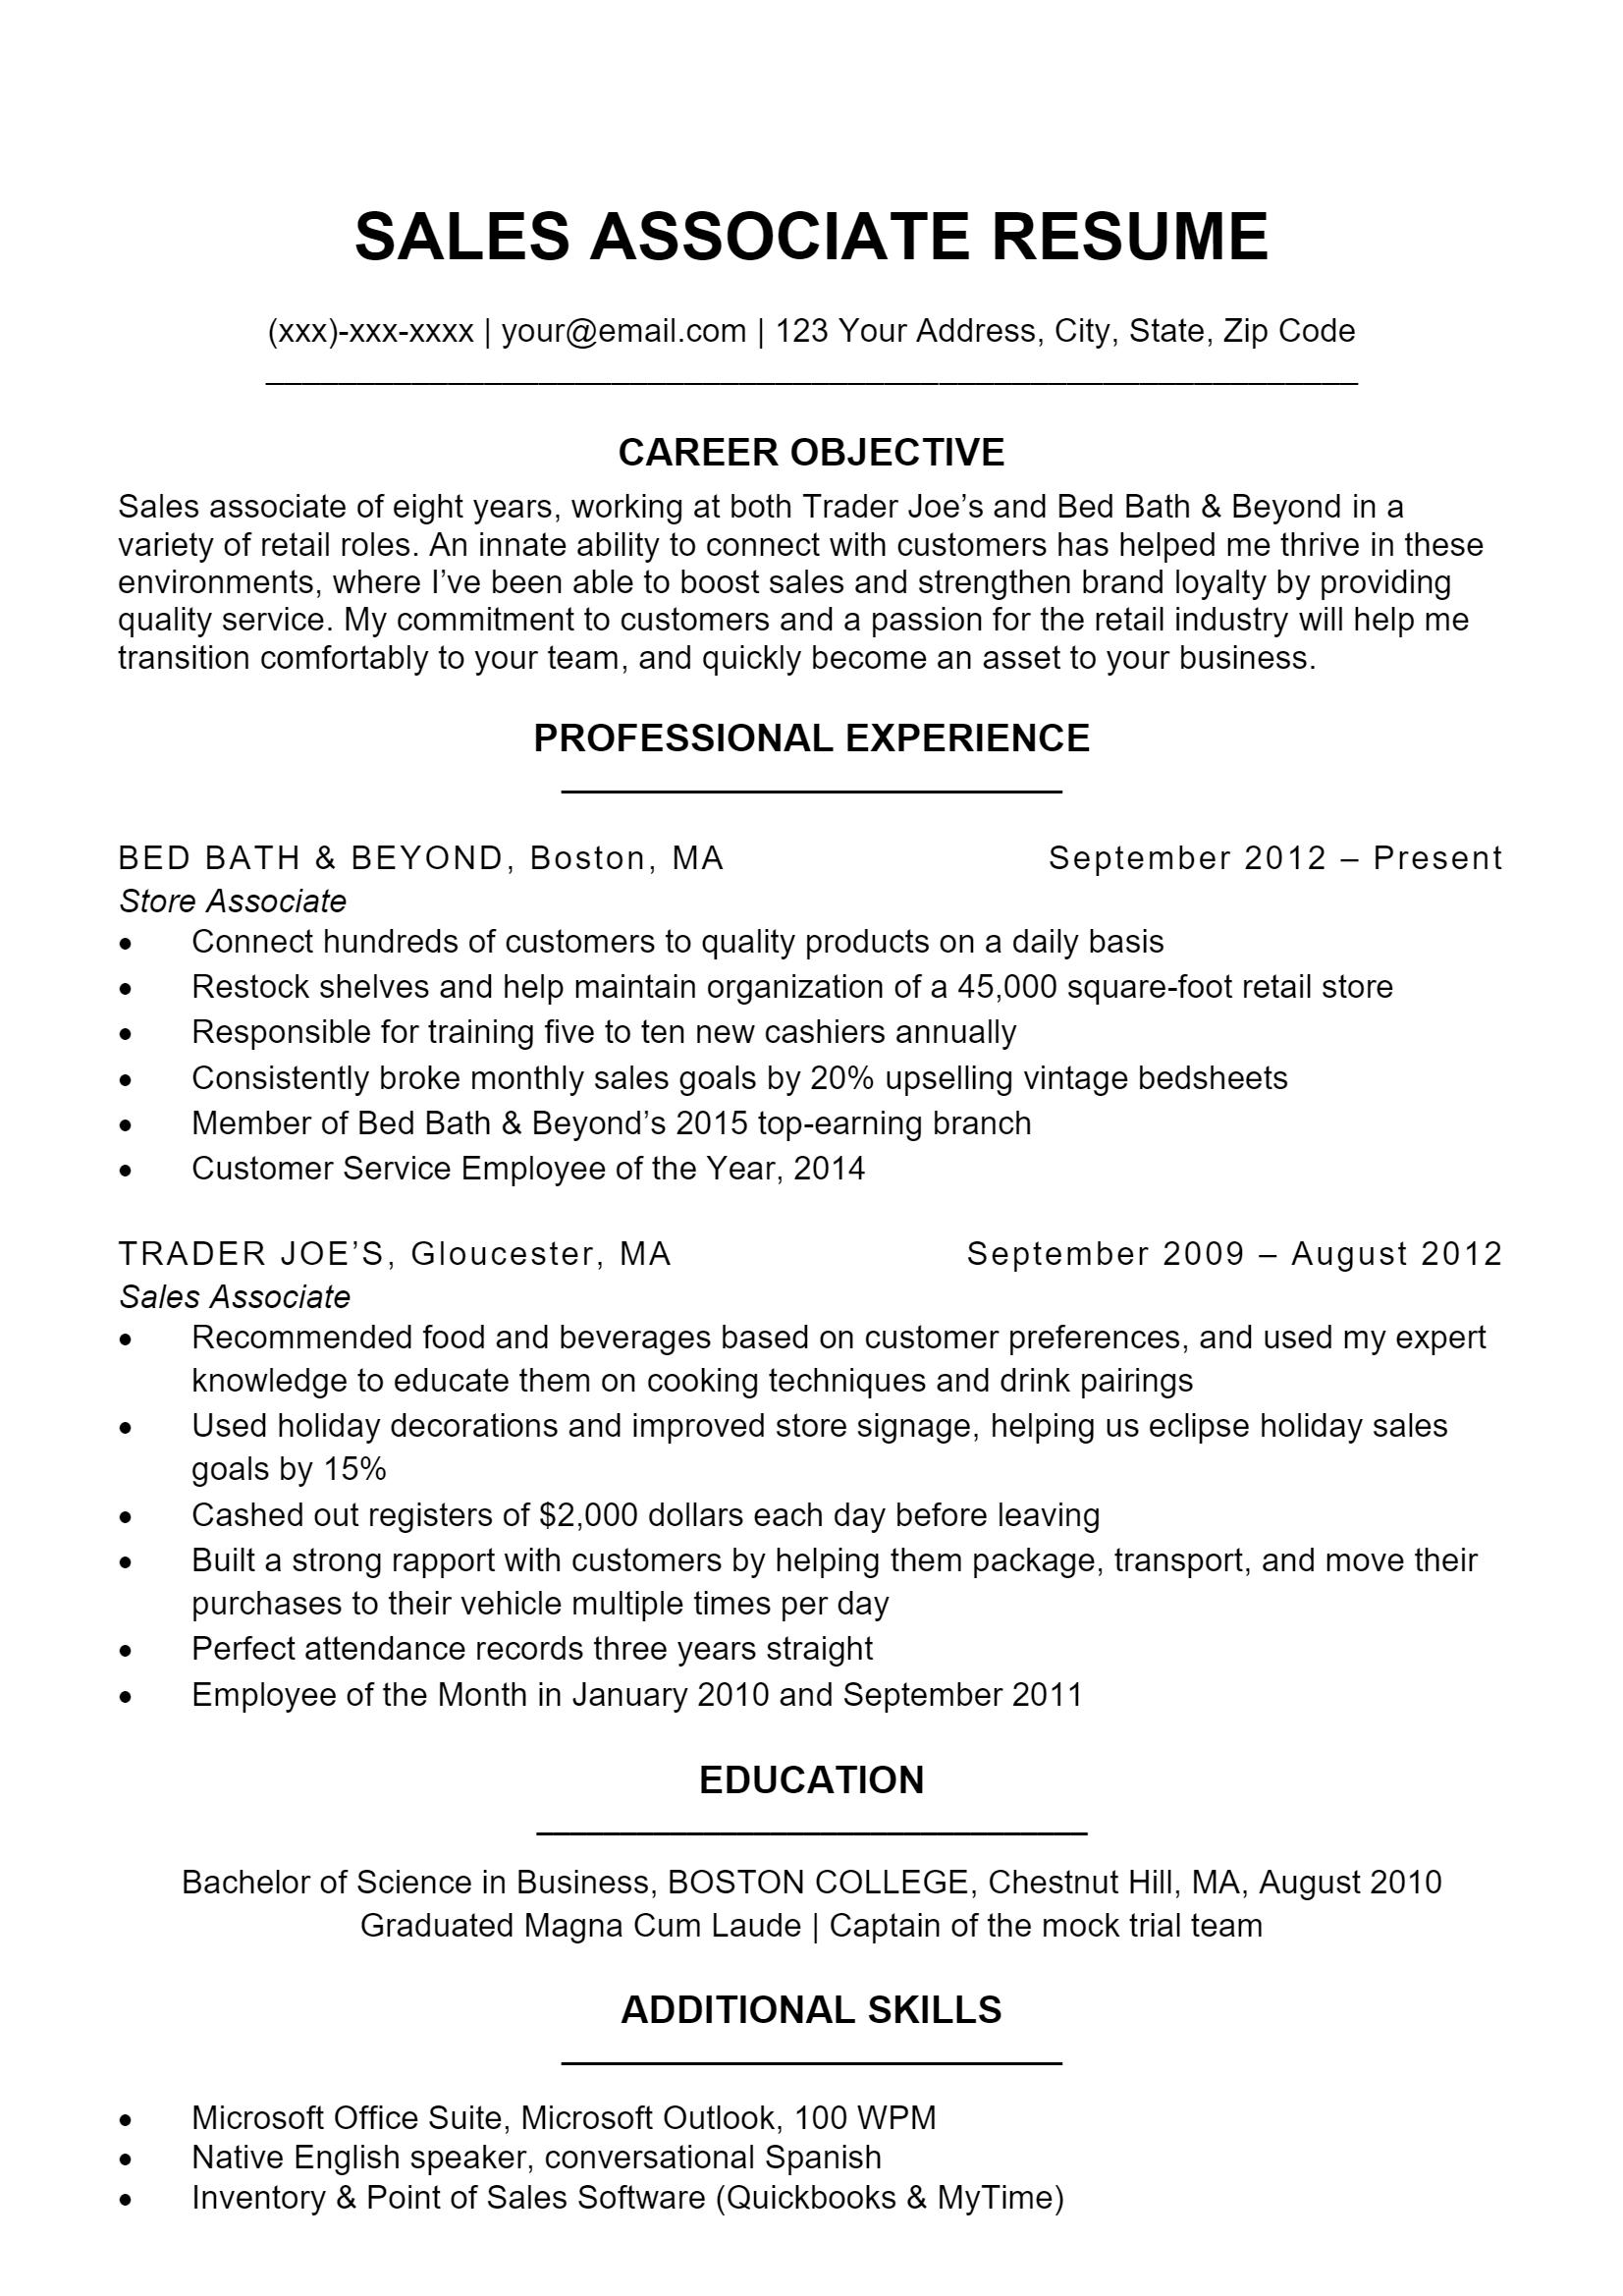 Sales Associate Resume > Sales Associate Resume .Docx (Word)